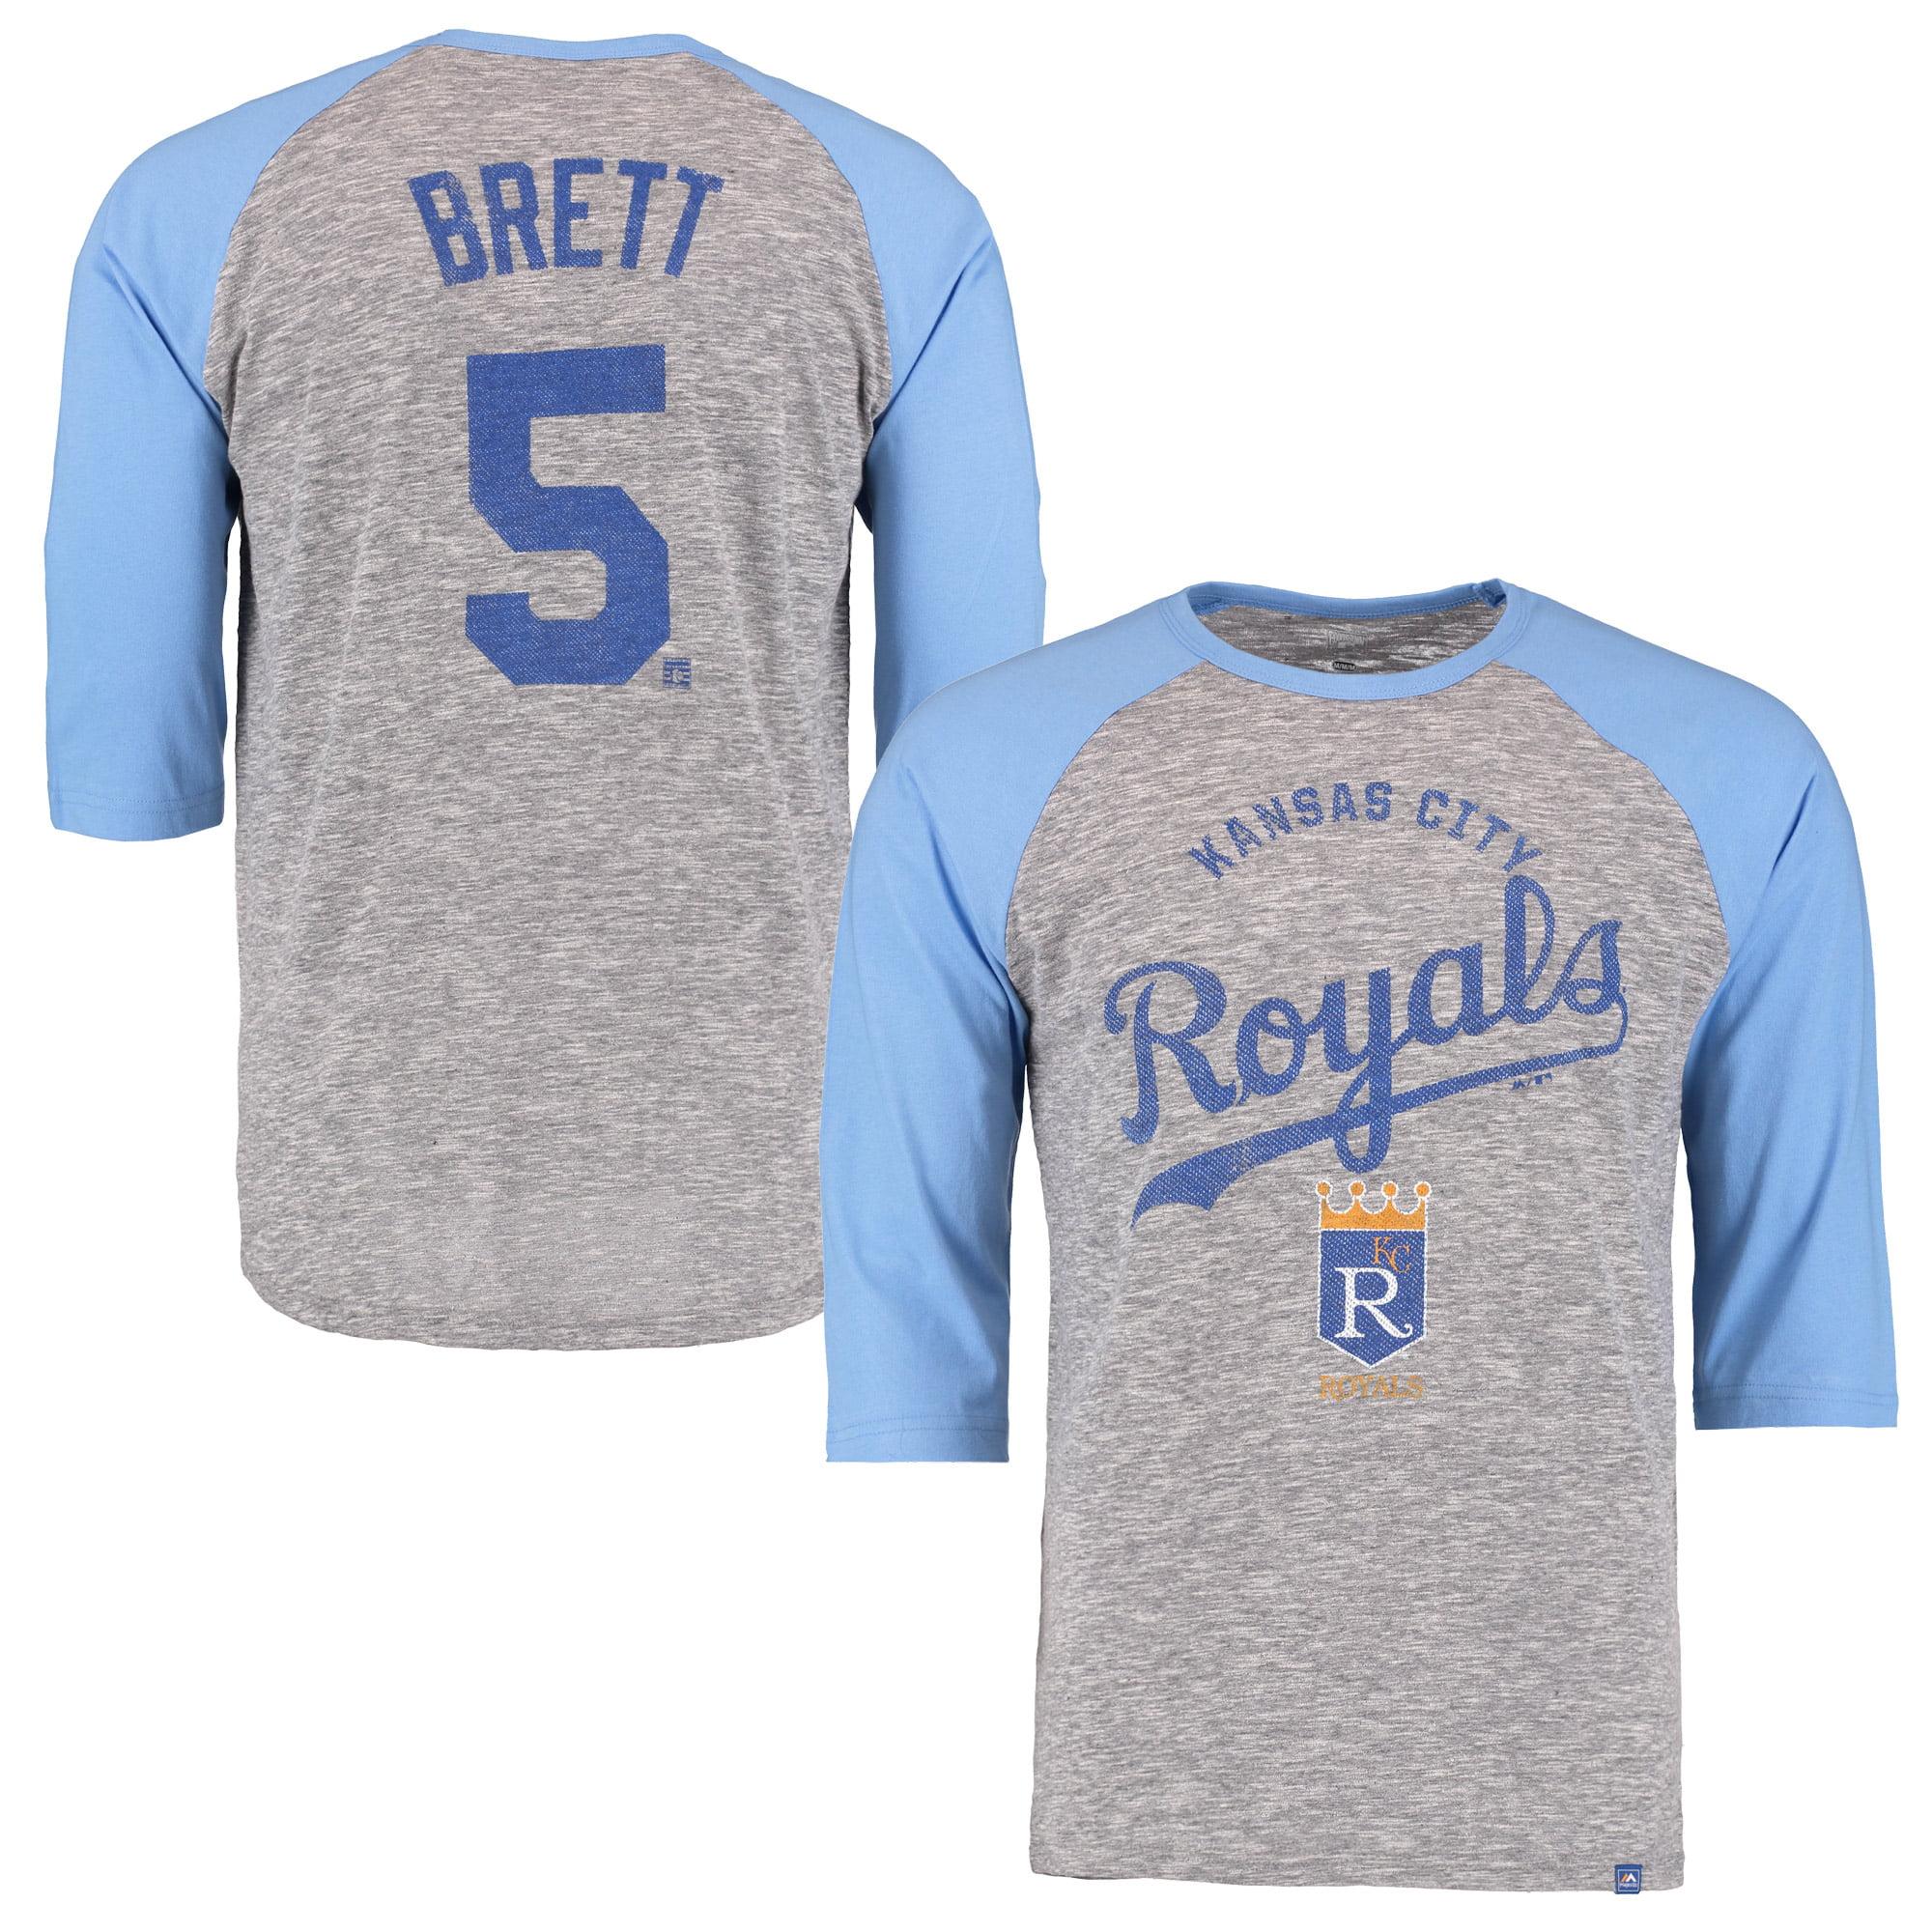 George Brett Kansas City Royals Majestic Player Tactics Cooperstown Three-Quarter Sleeve Raglan T-Shirt - Gray